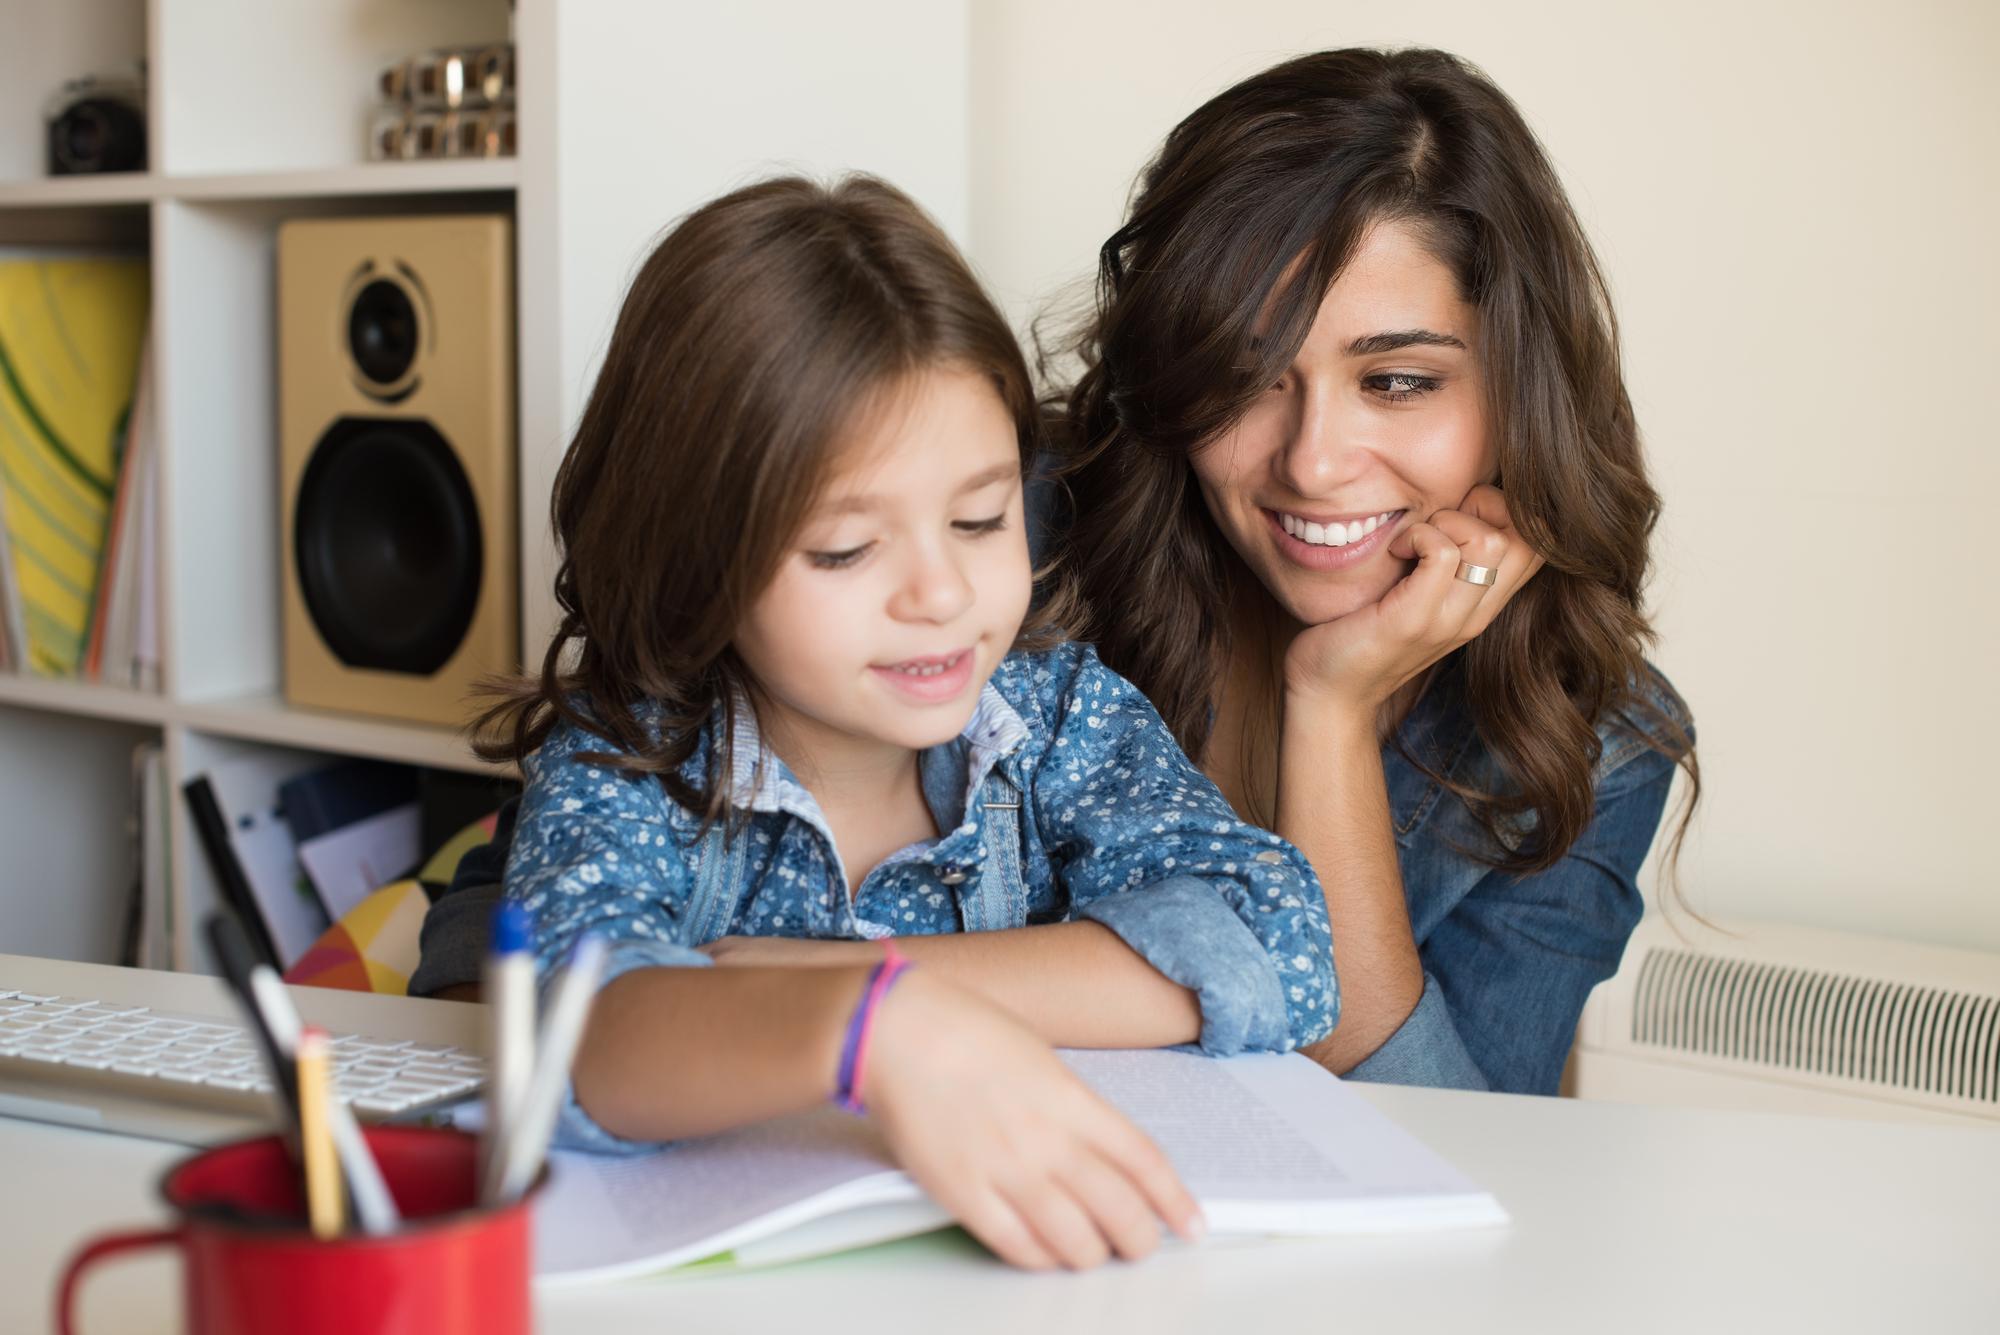 prep-your-child-for-exam.jpg